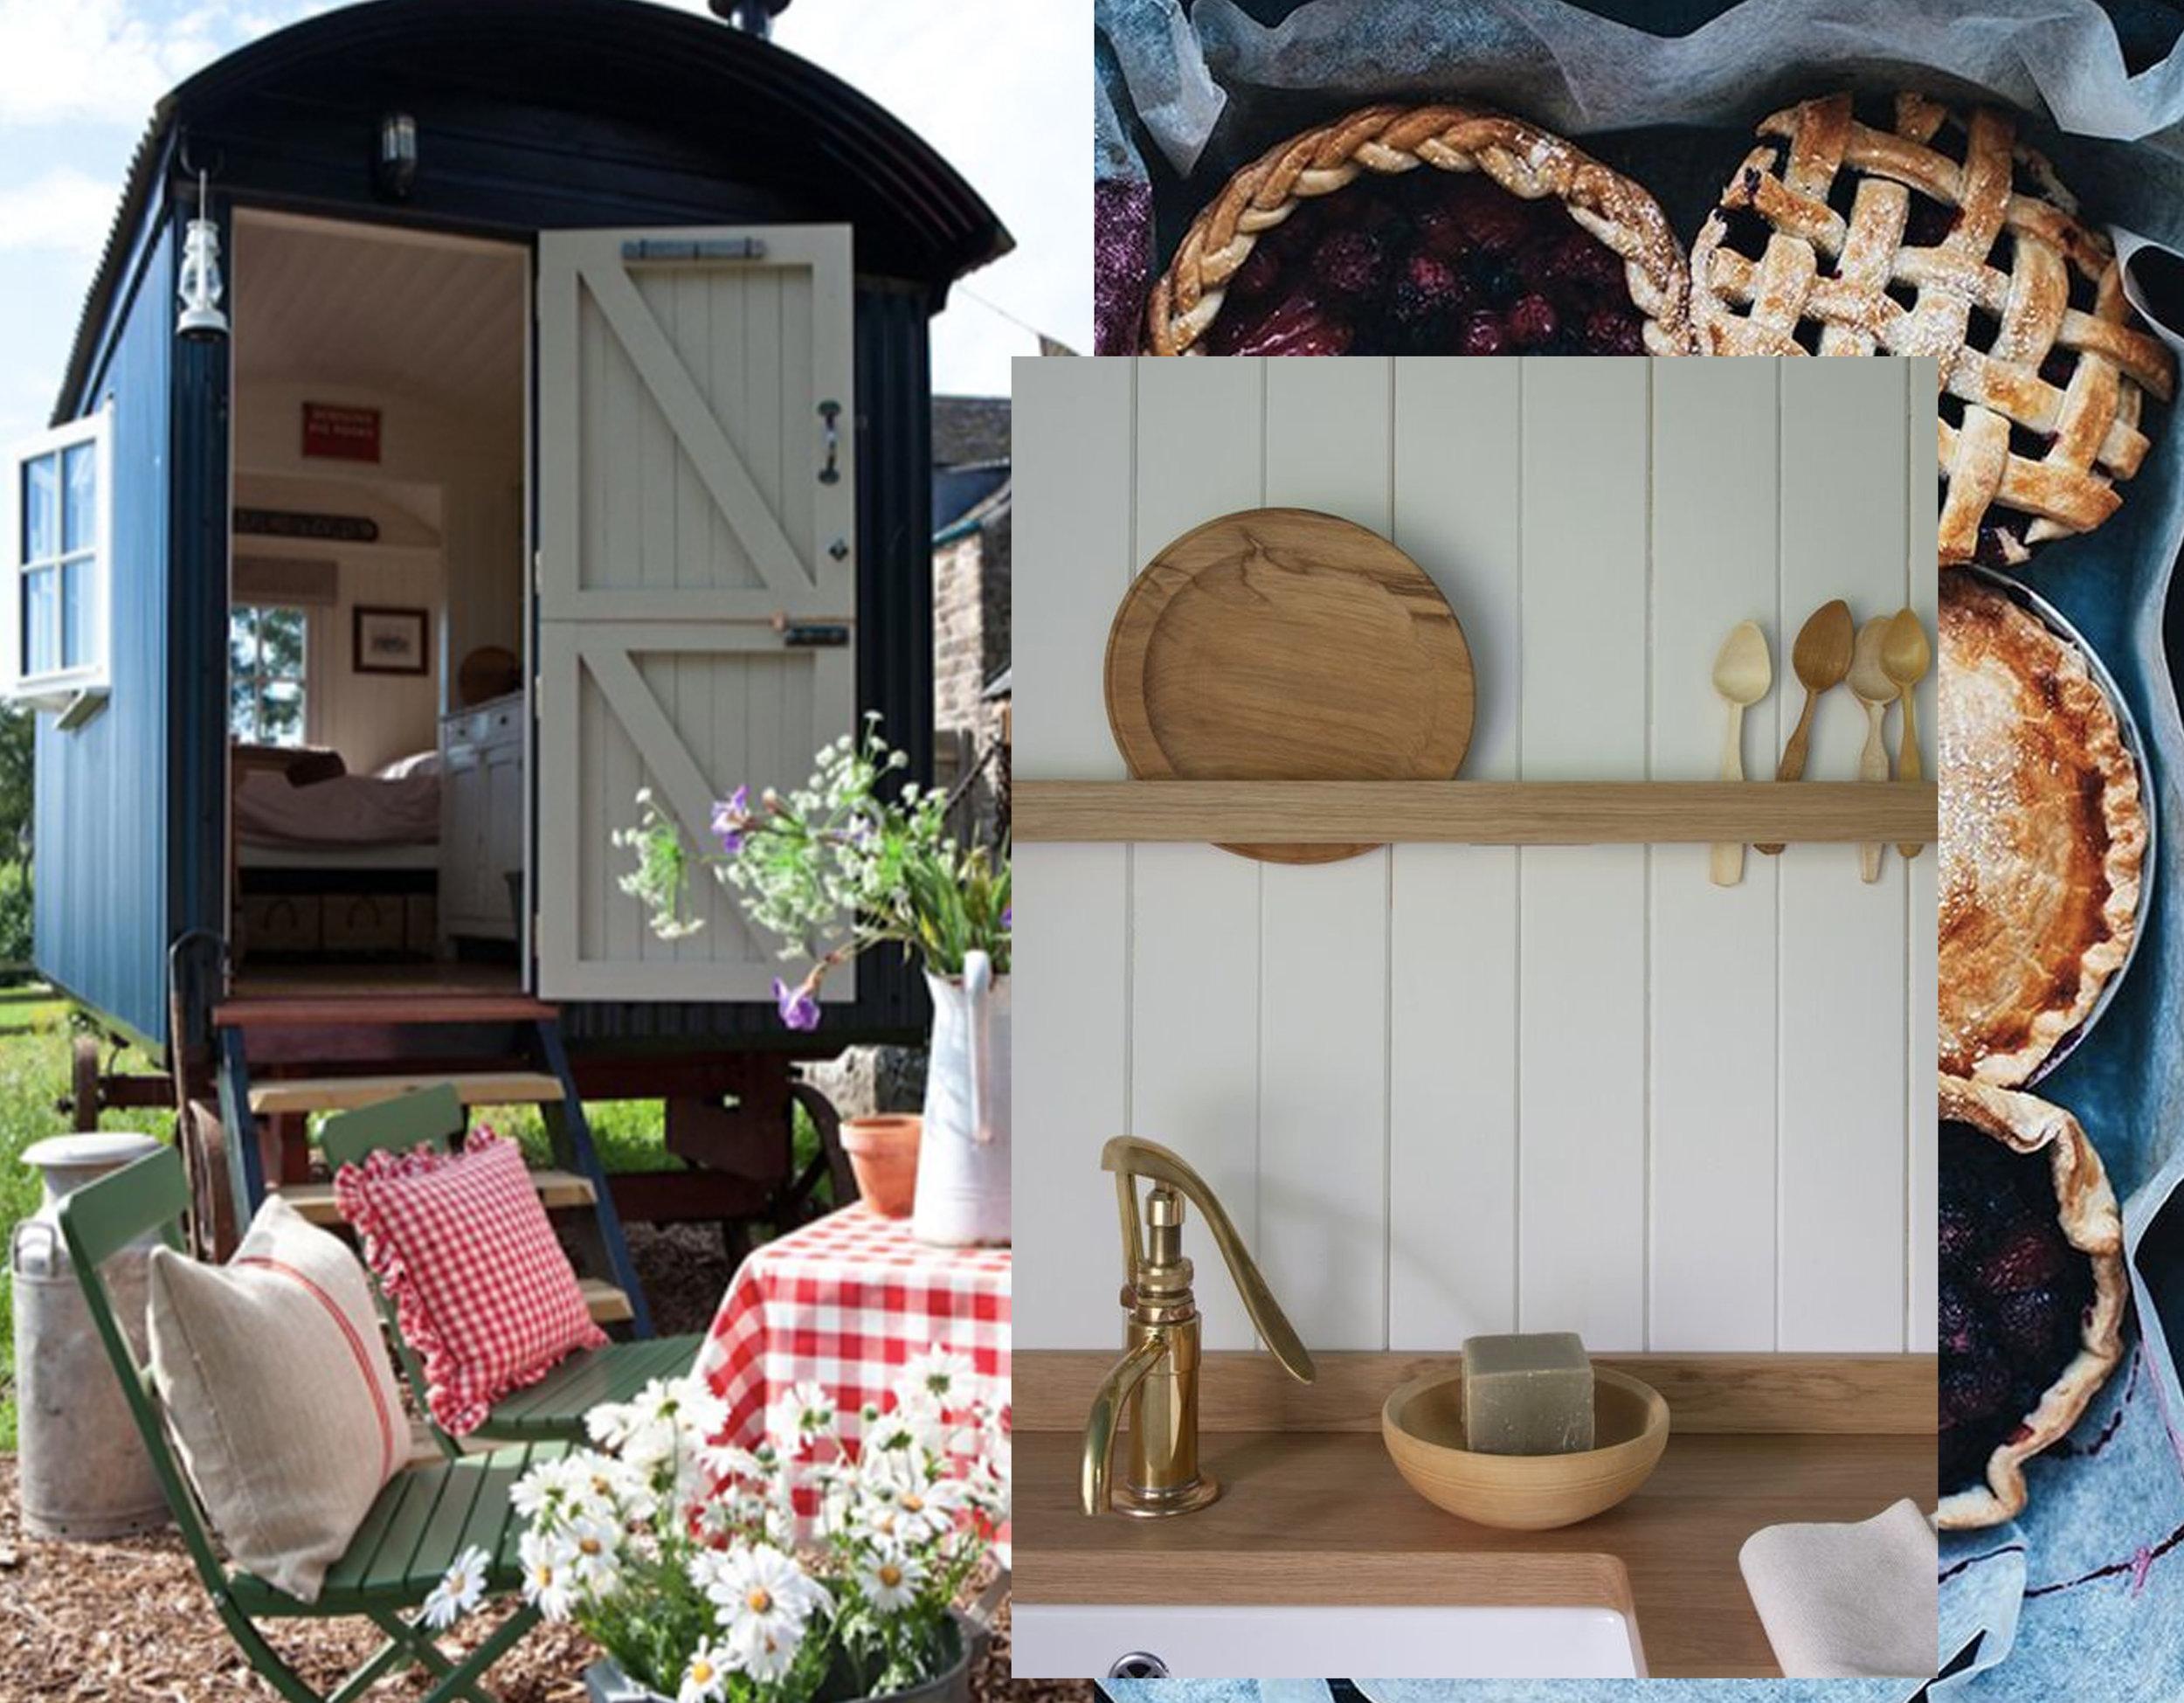 vagon via  Pinterest - summer pies via  Waiting on Martha  - kitchen via via  Remodelista